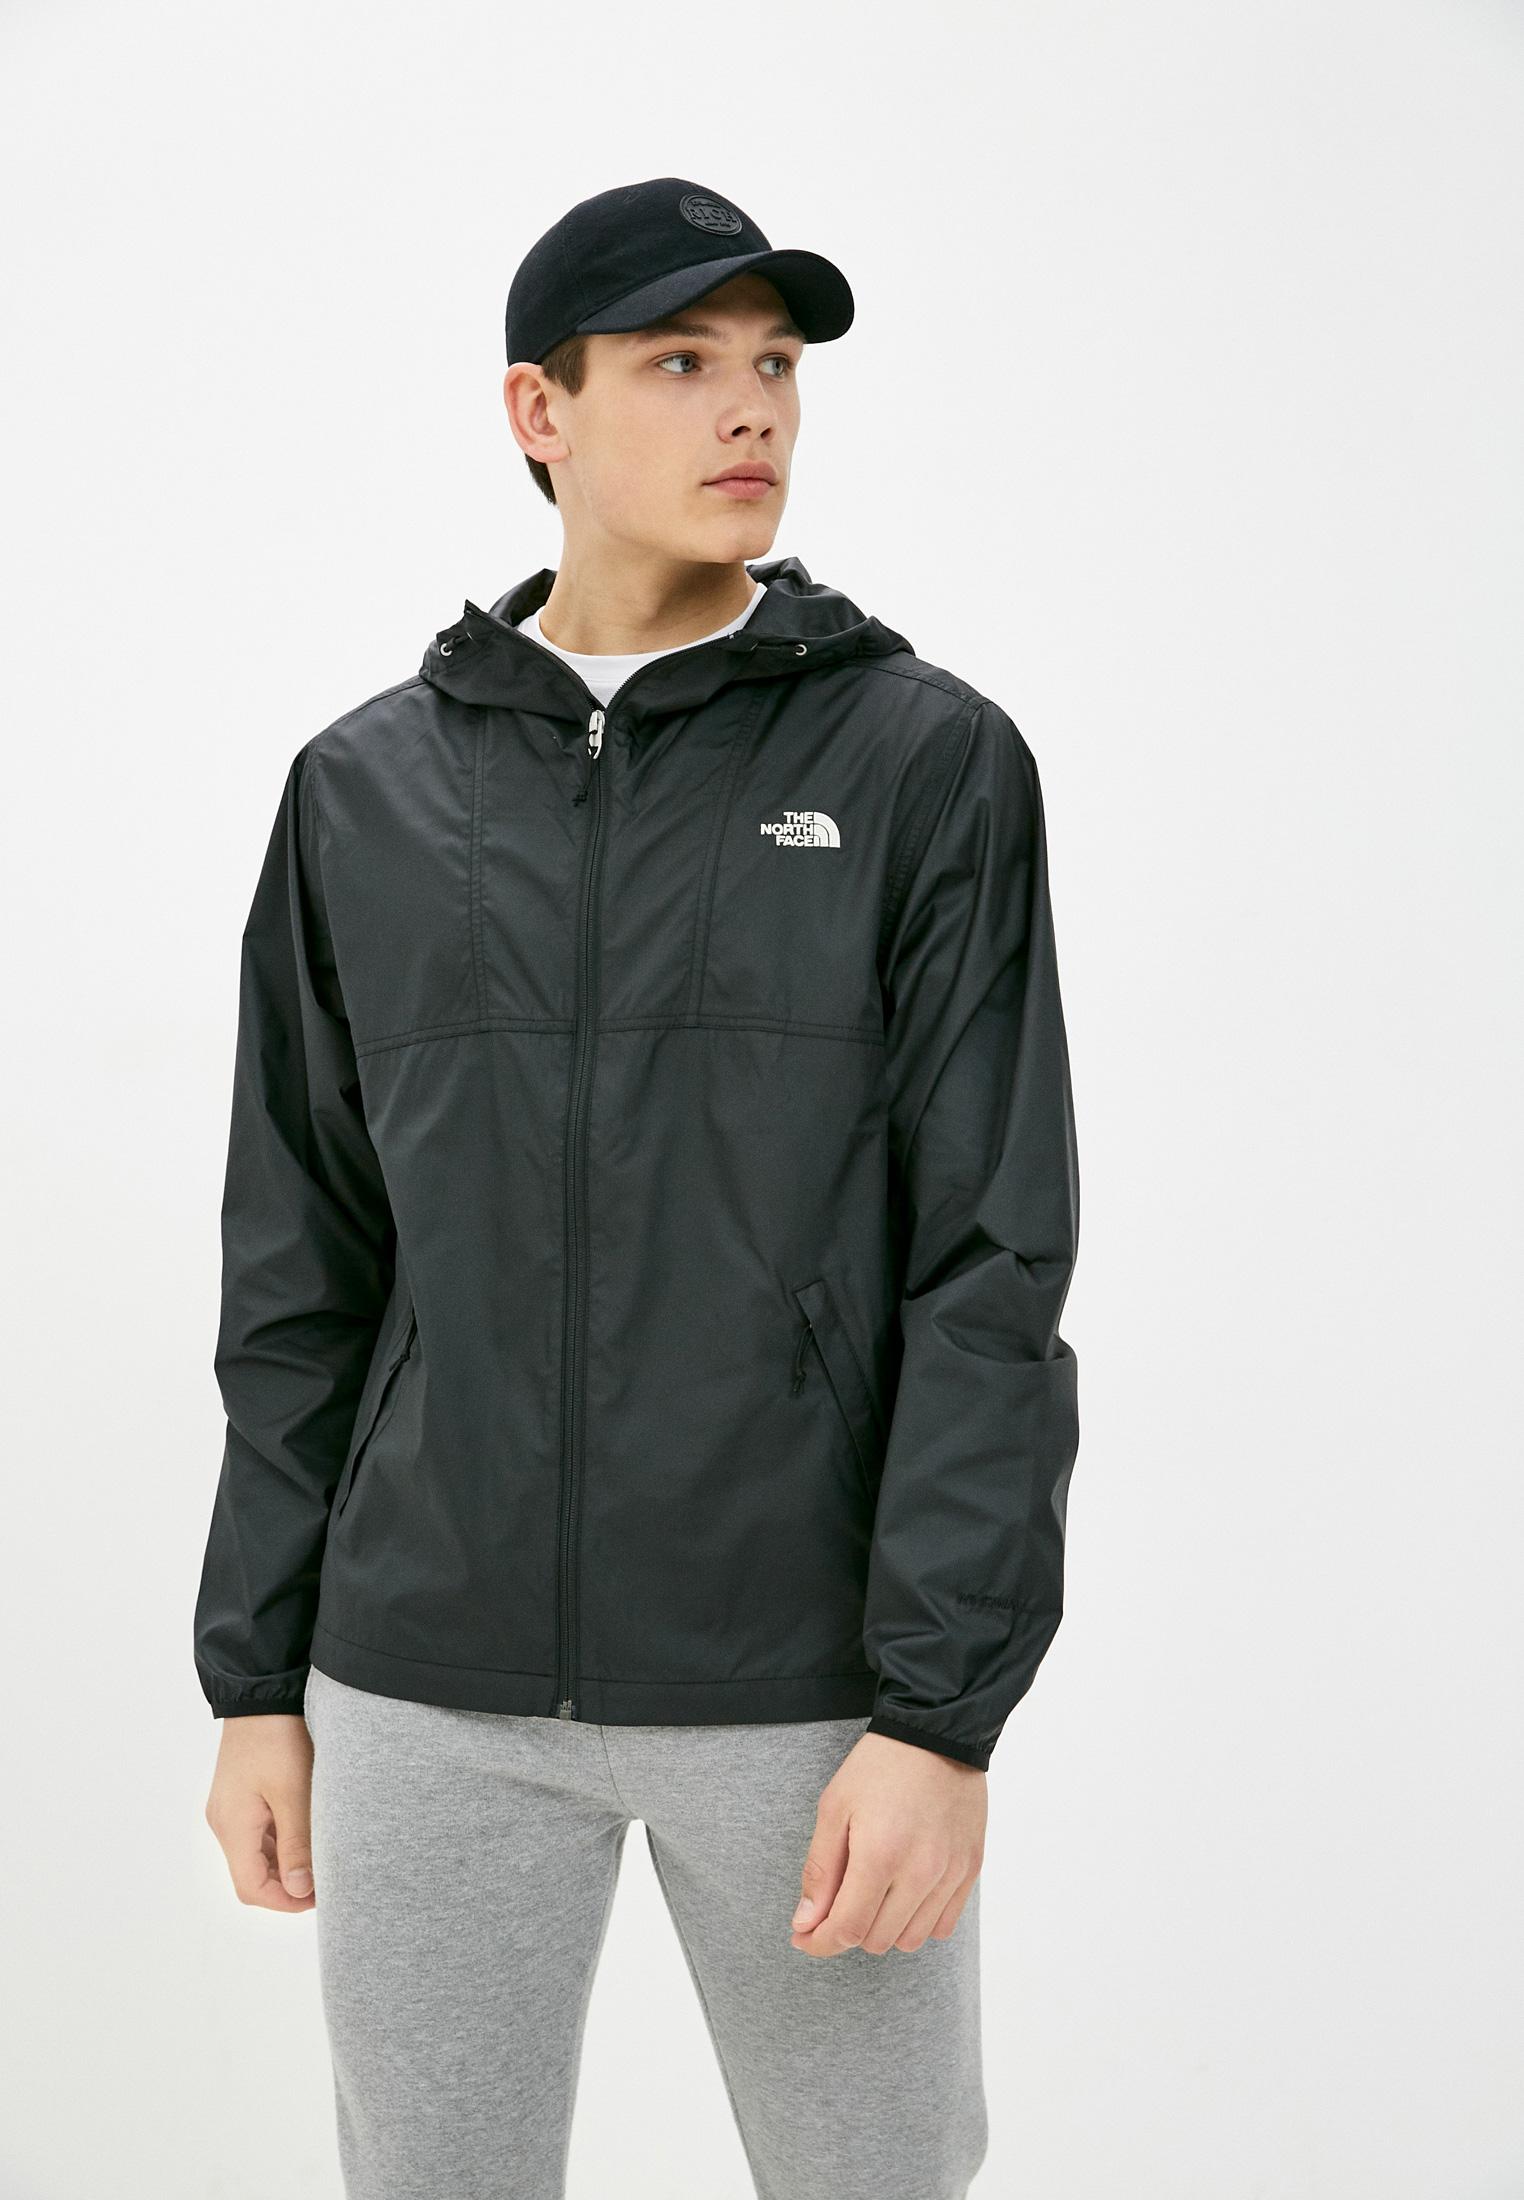 Мужская верхняя одежда The North Face (Зе Норт Фейс) TA55ST